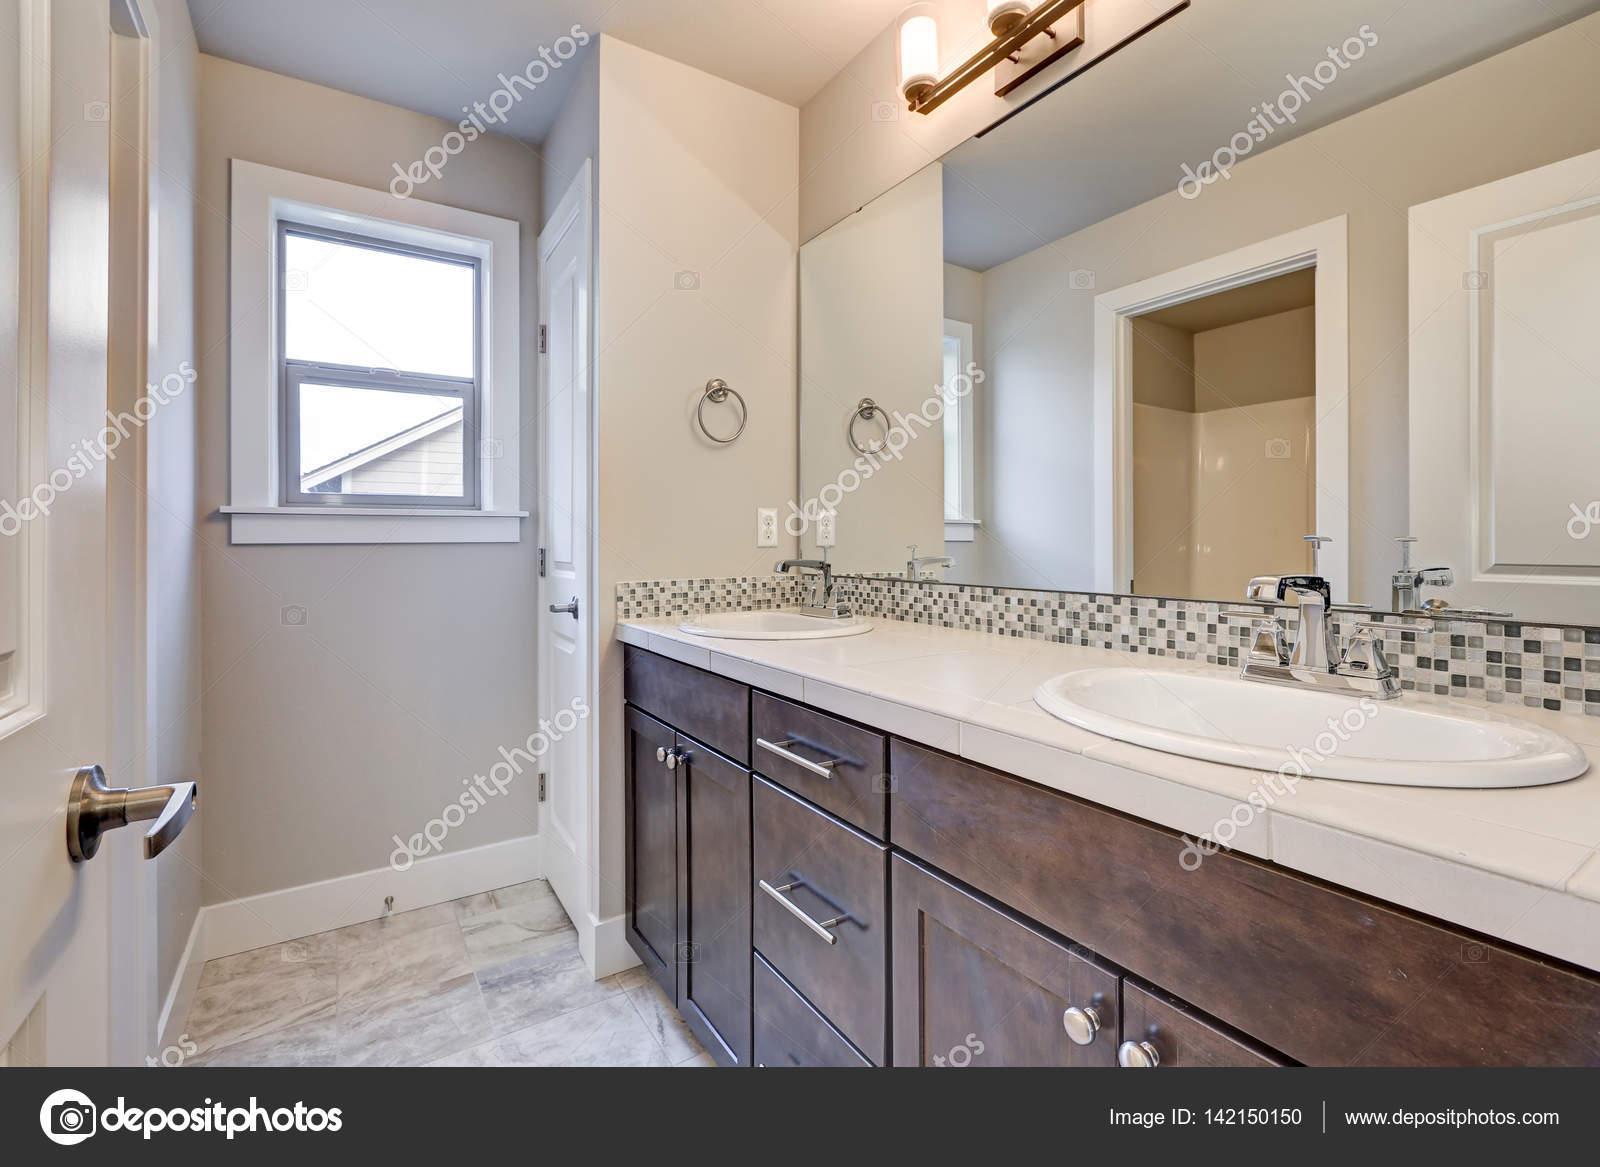 new light bathroom interior with double sink dark wood bathroom vanity stock photo image by c iriana88w 142150150